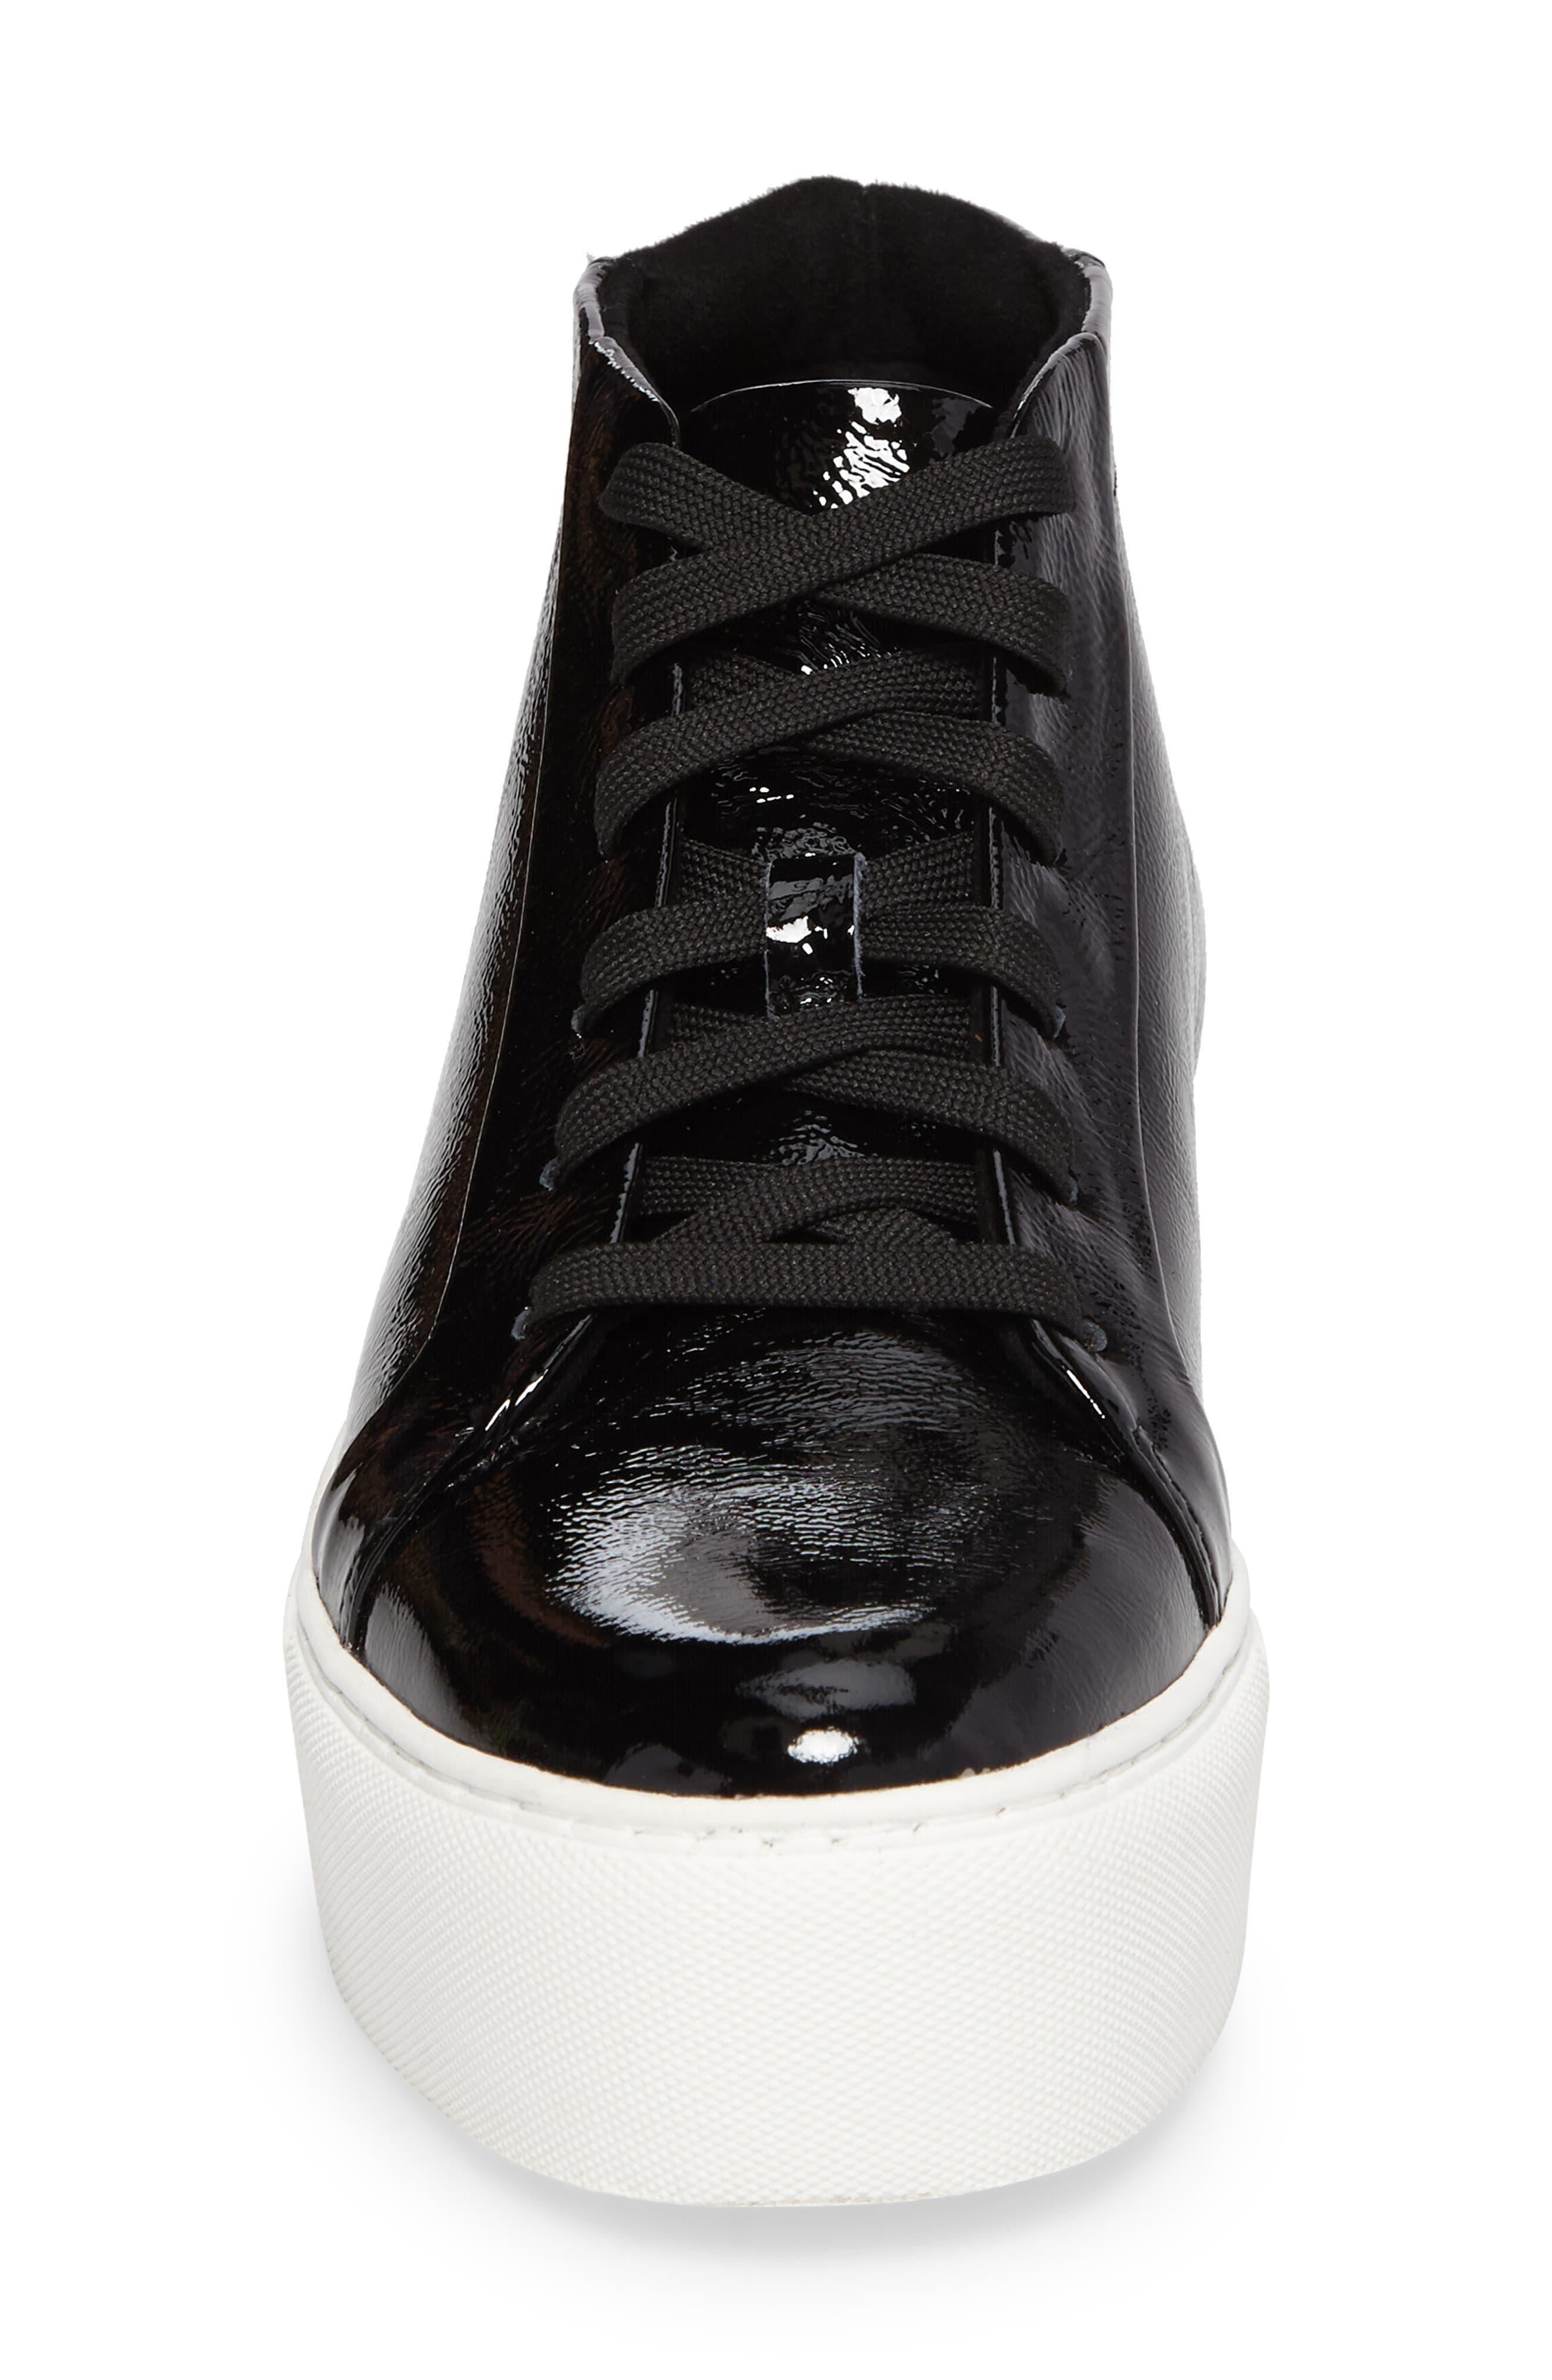 Janette High Top Platform Sneaker,                             Alternate thumbnail 4, color,                             BLACK PATENT LEATHER